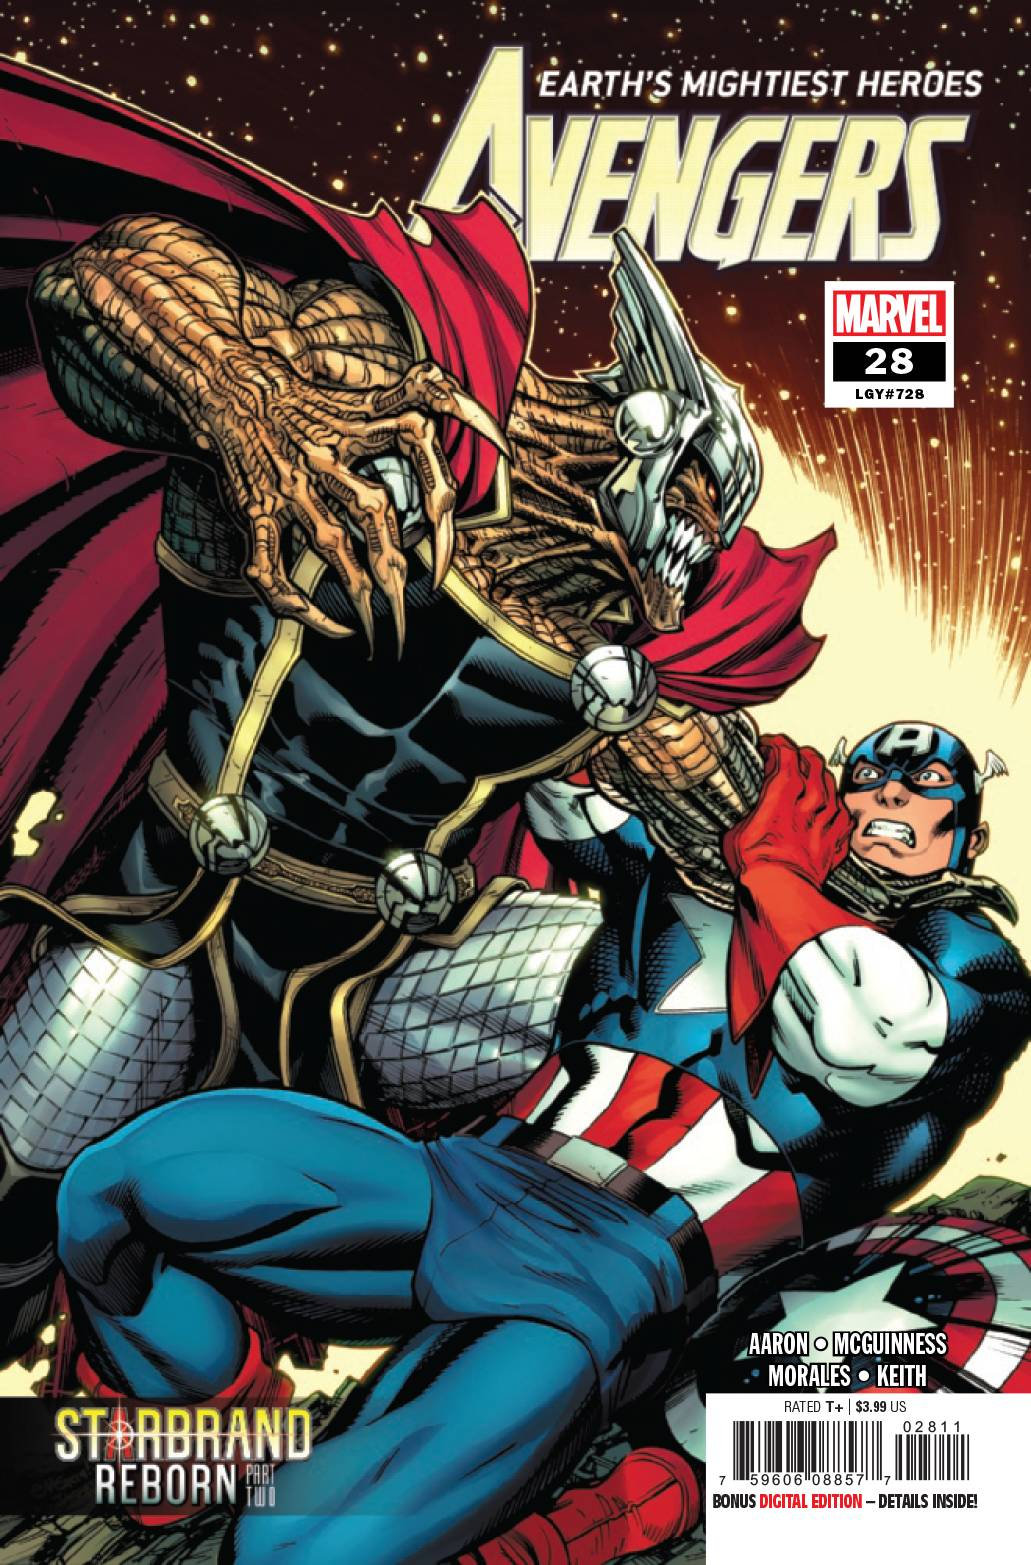 Avengers: Earth's Mightiest Heroes #28 (2019)